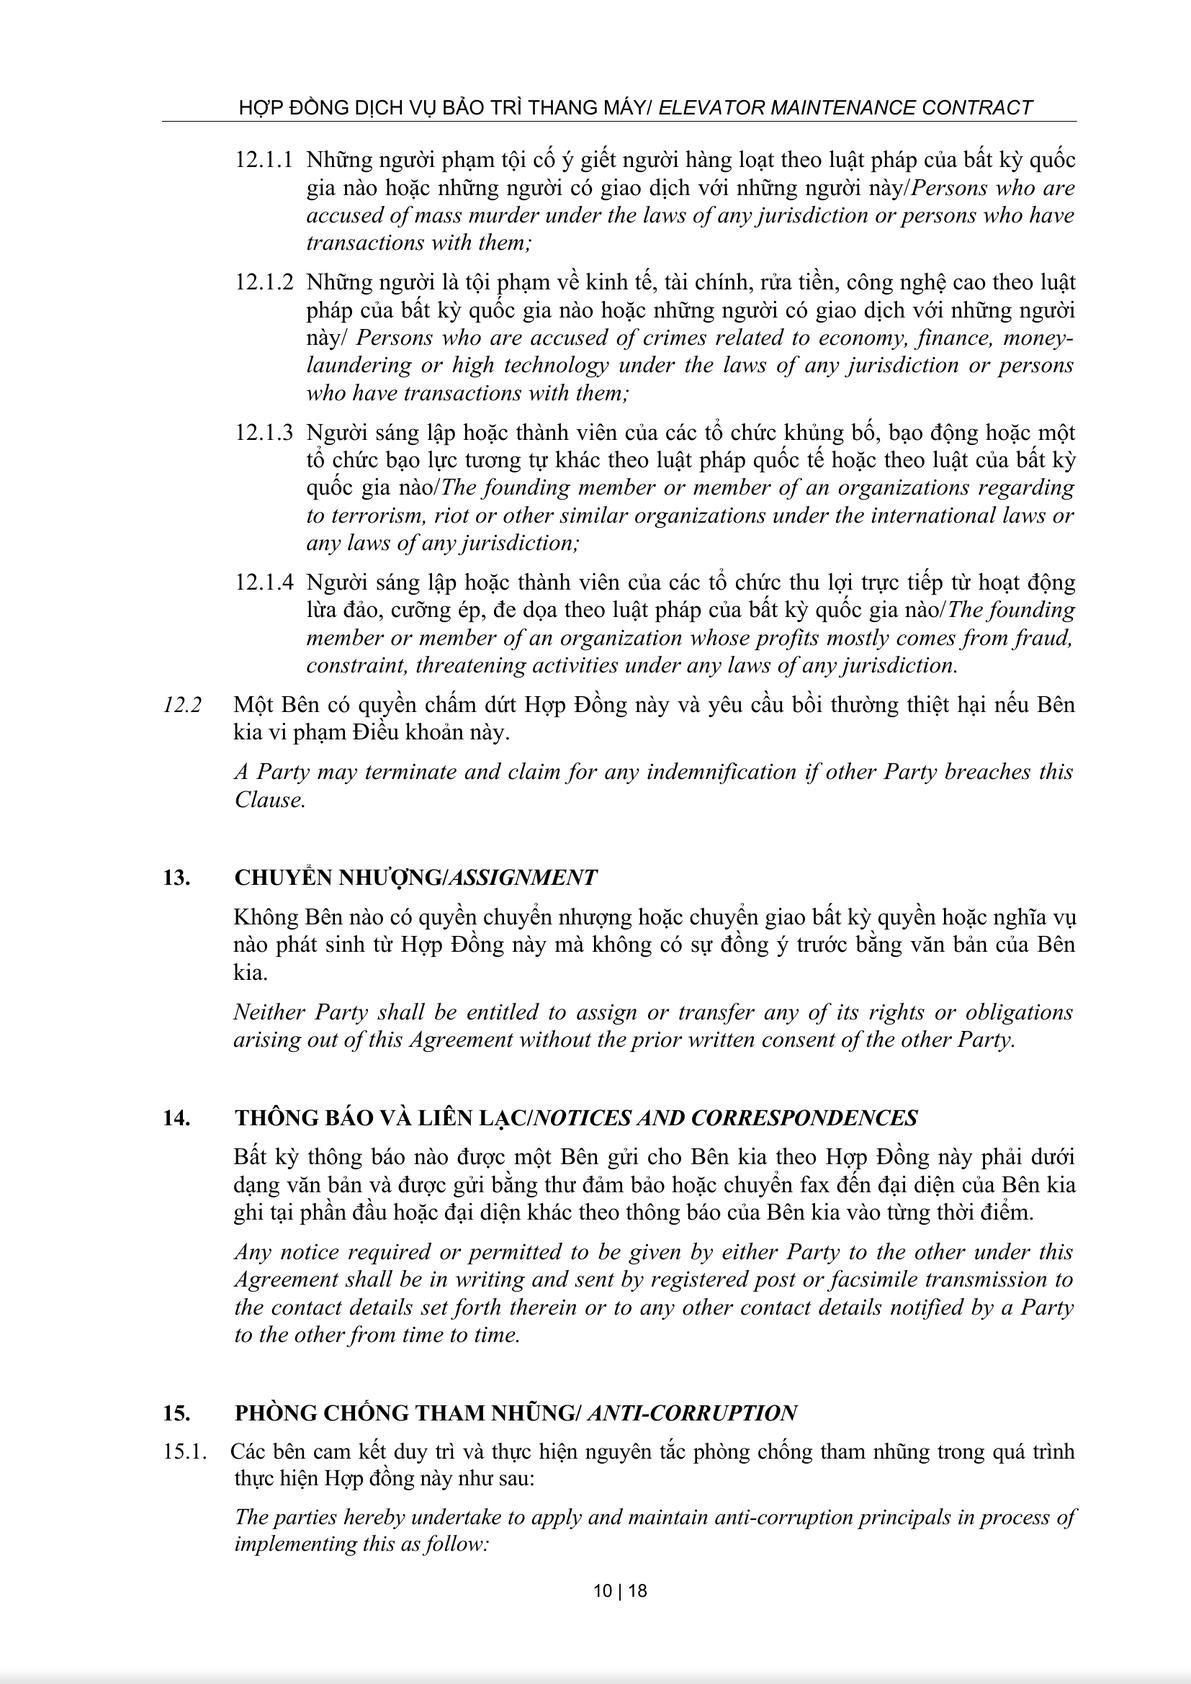 Maintenance Service Agreement-9